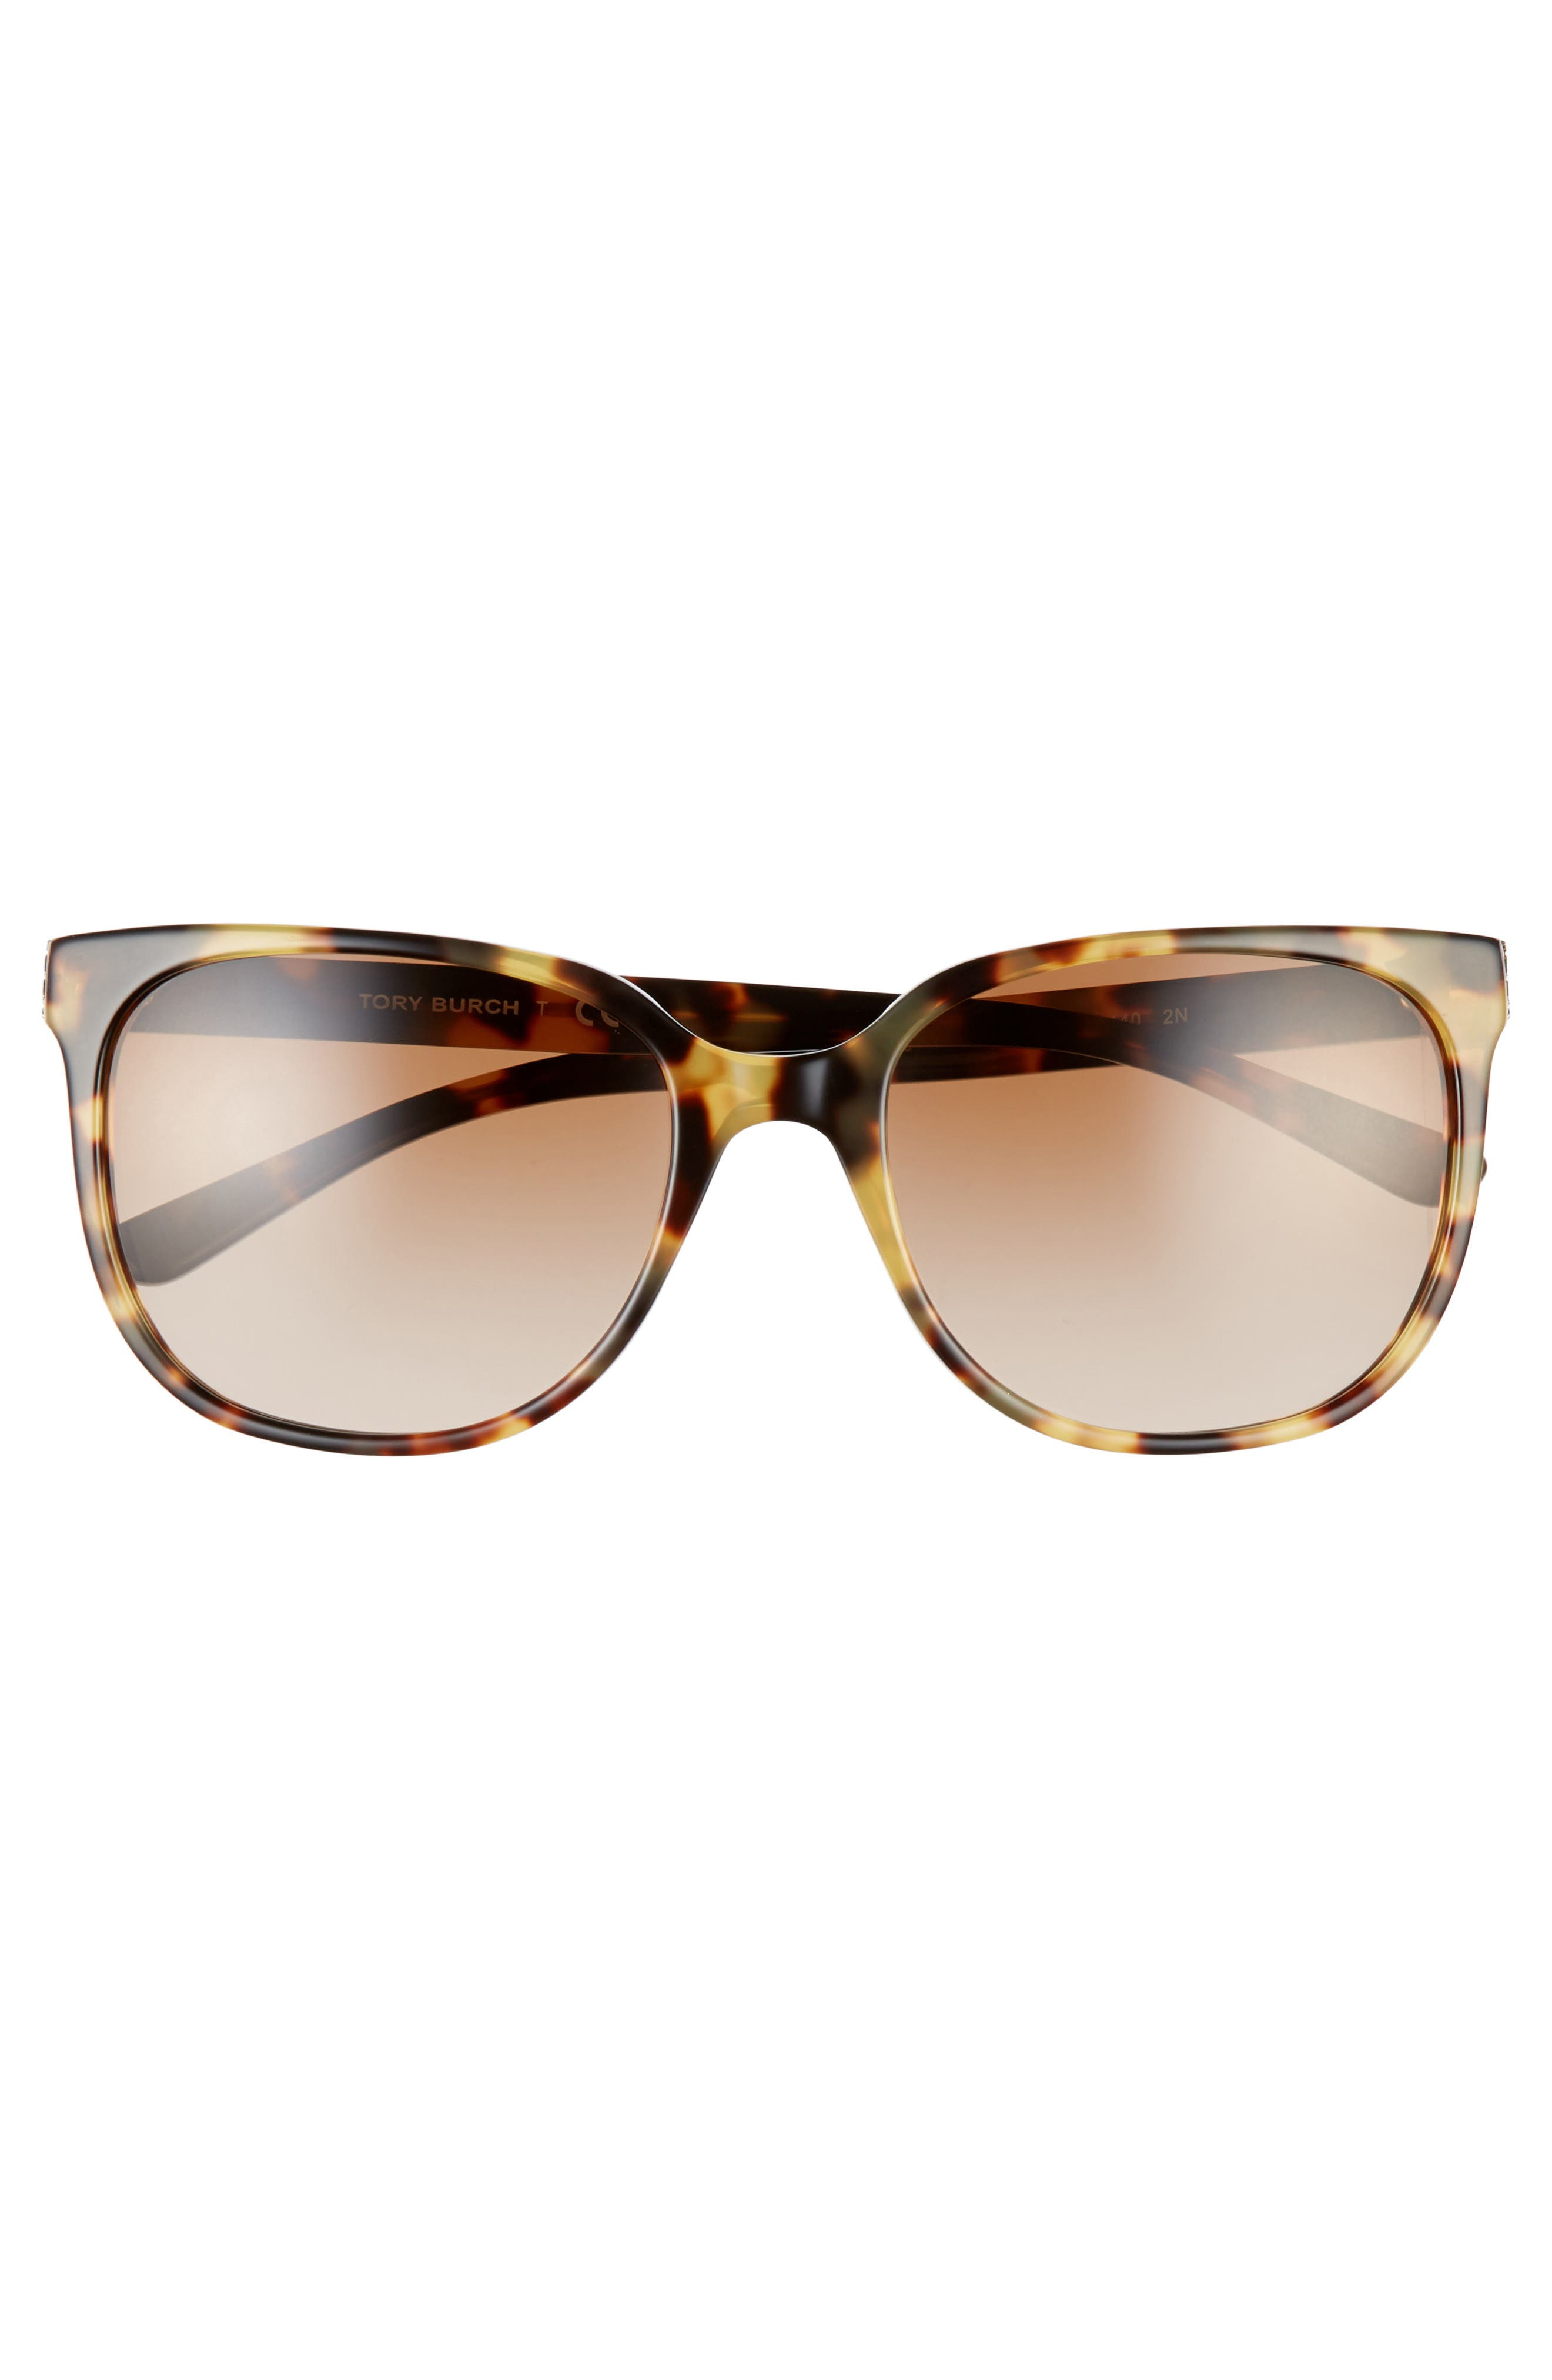 TORY BURCH, 57mm Gradient Sunglasses, Alternate thumbnail 3, color, 205